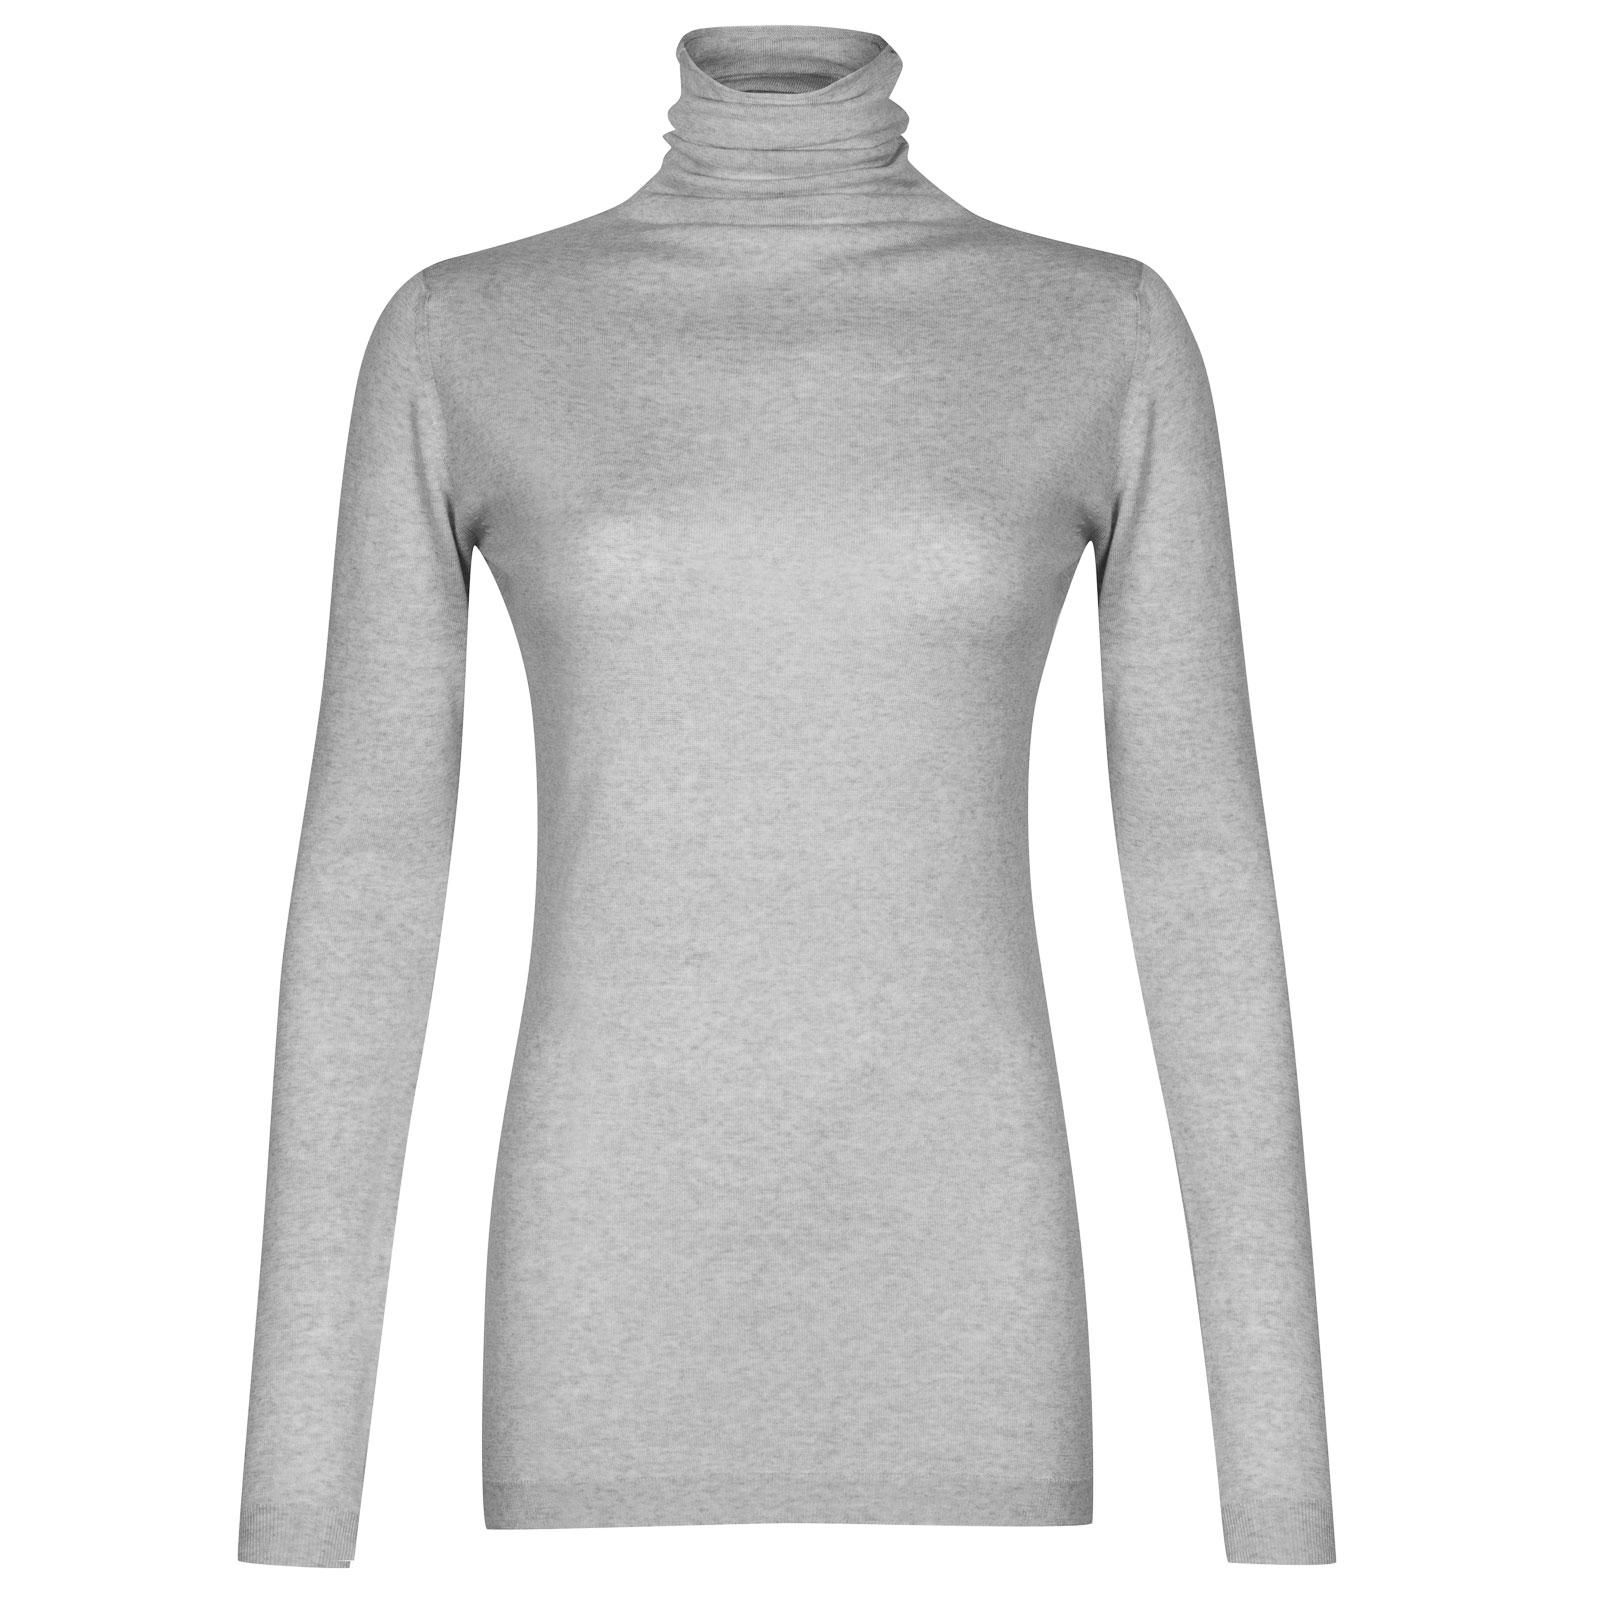 John Smedley westley Merino Wool Sweater in Bardot Grey-L